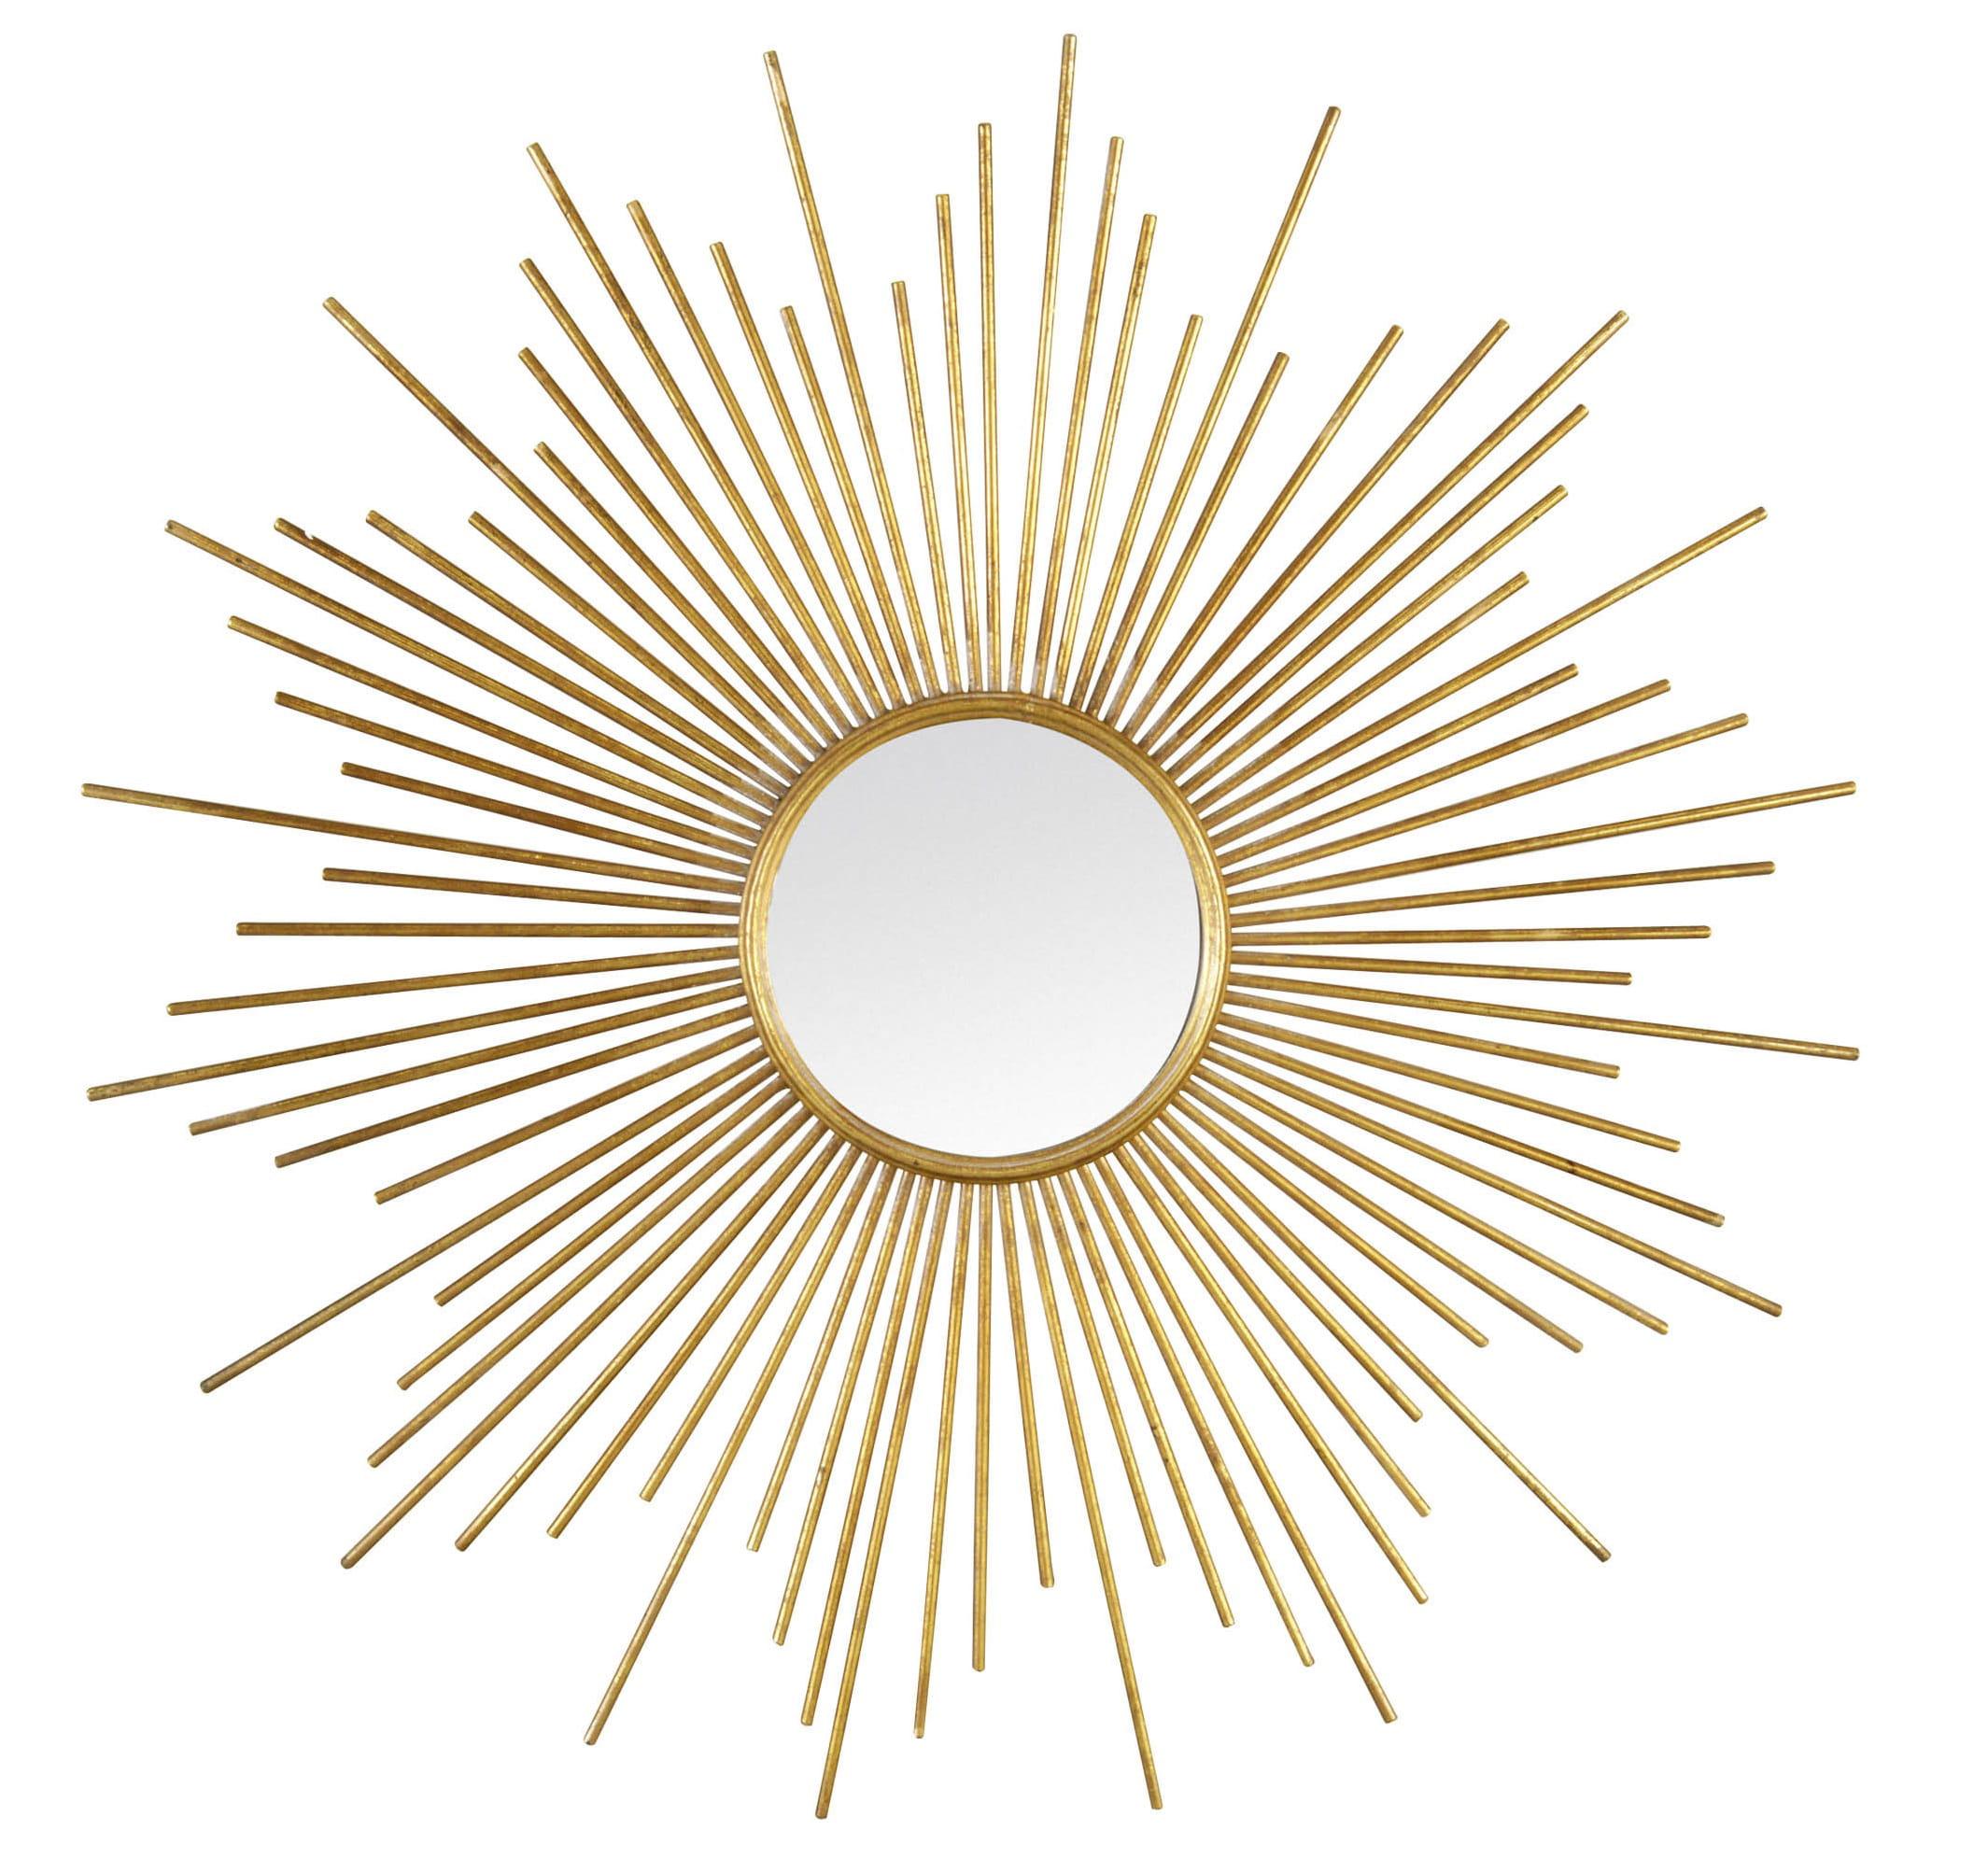 Miroir Soleil De Leroy Merlin